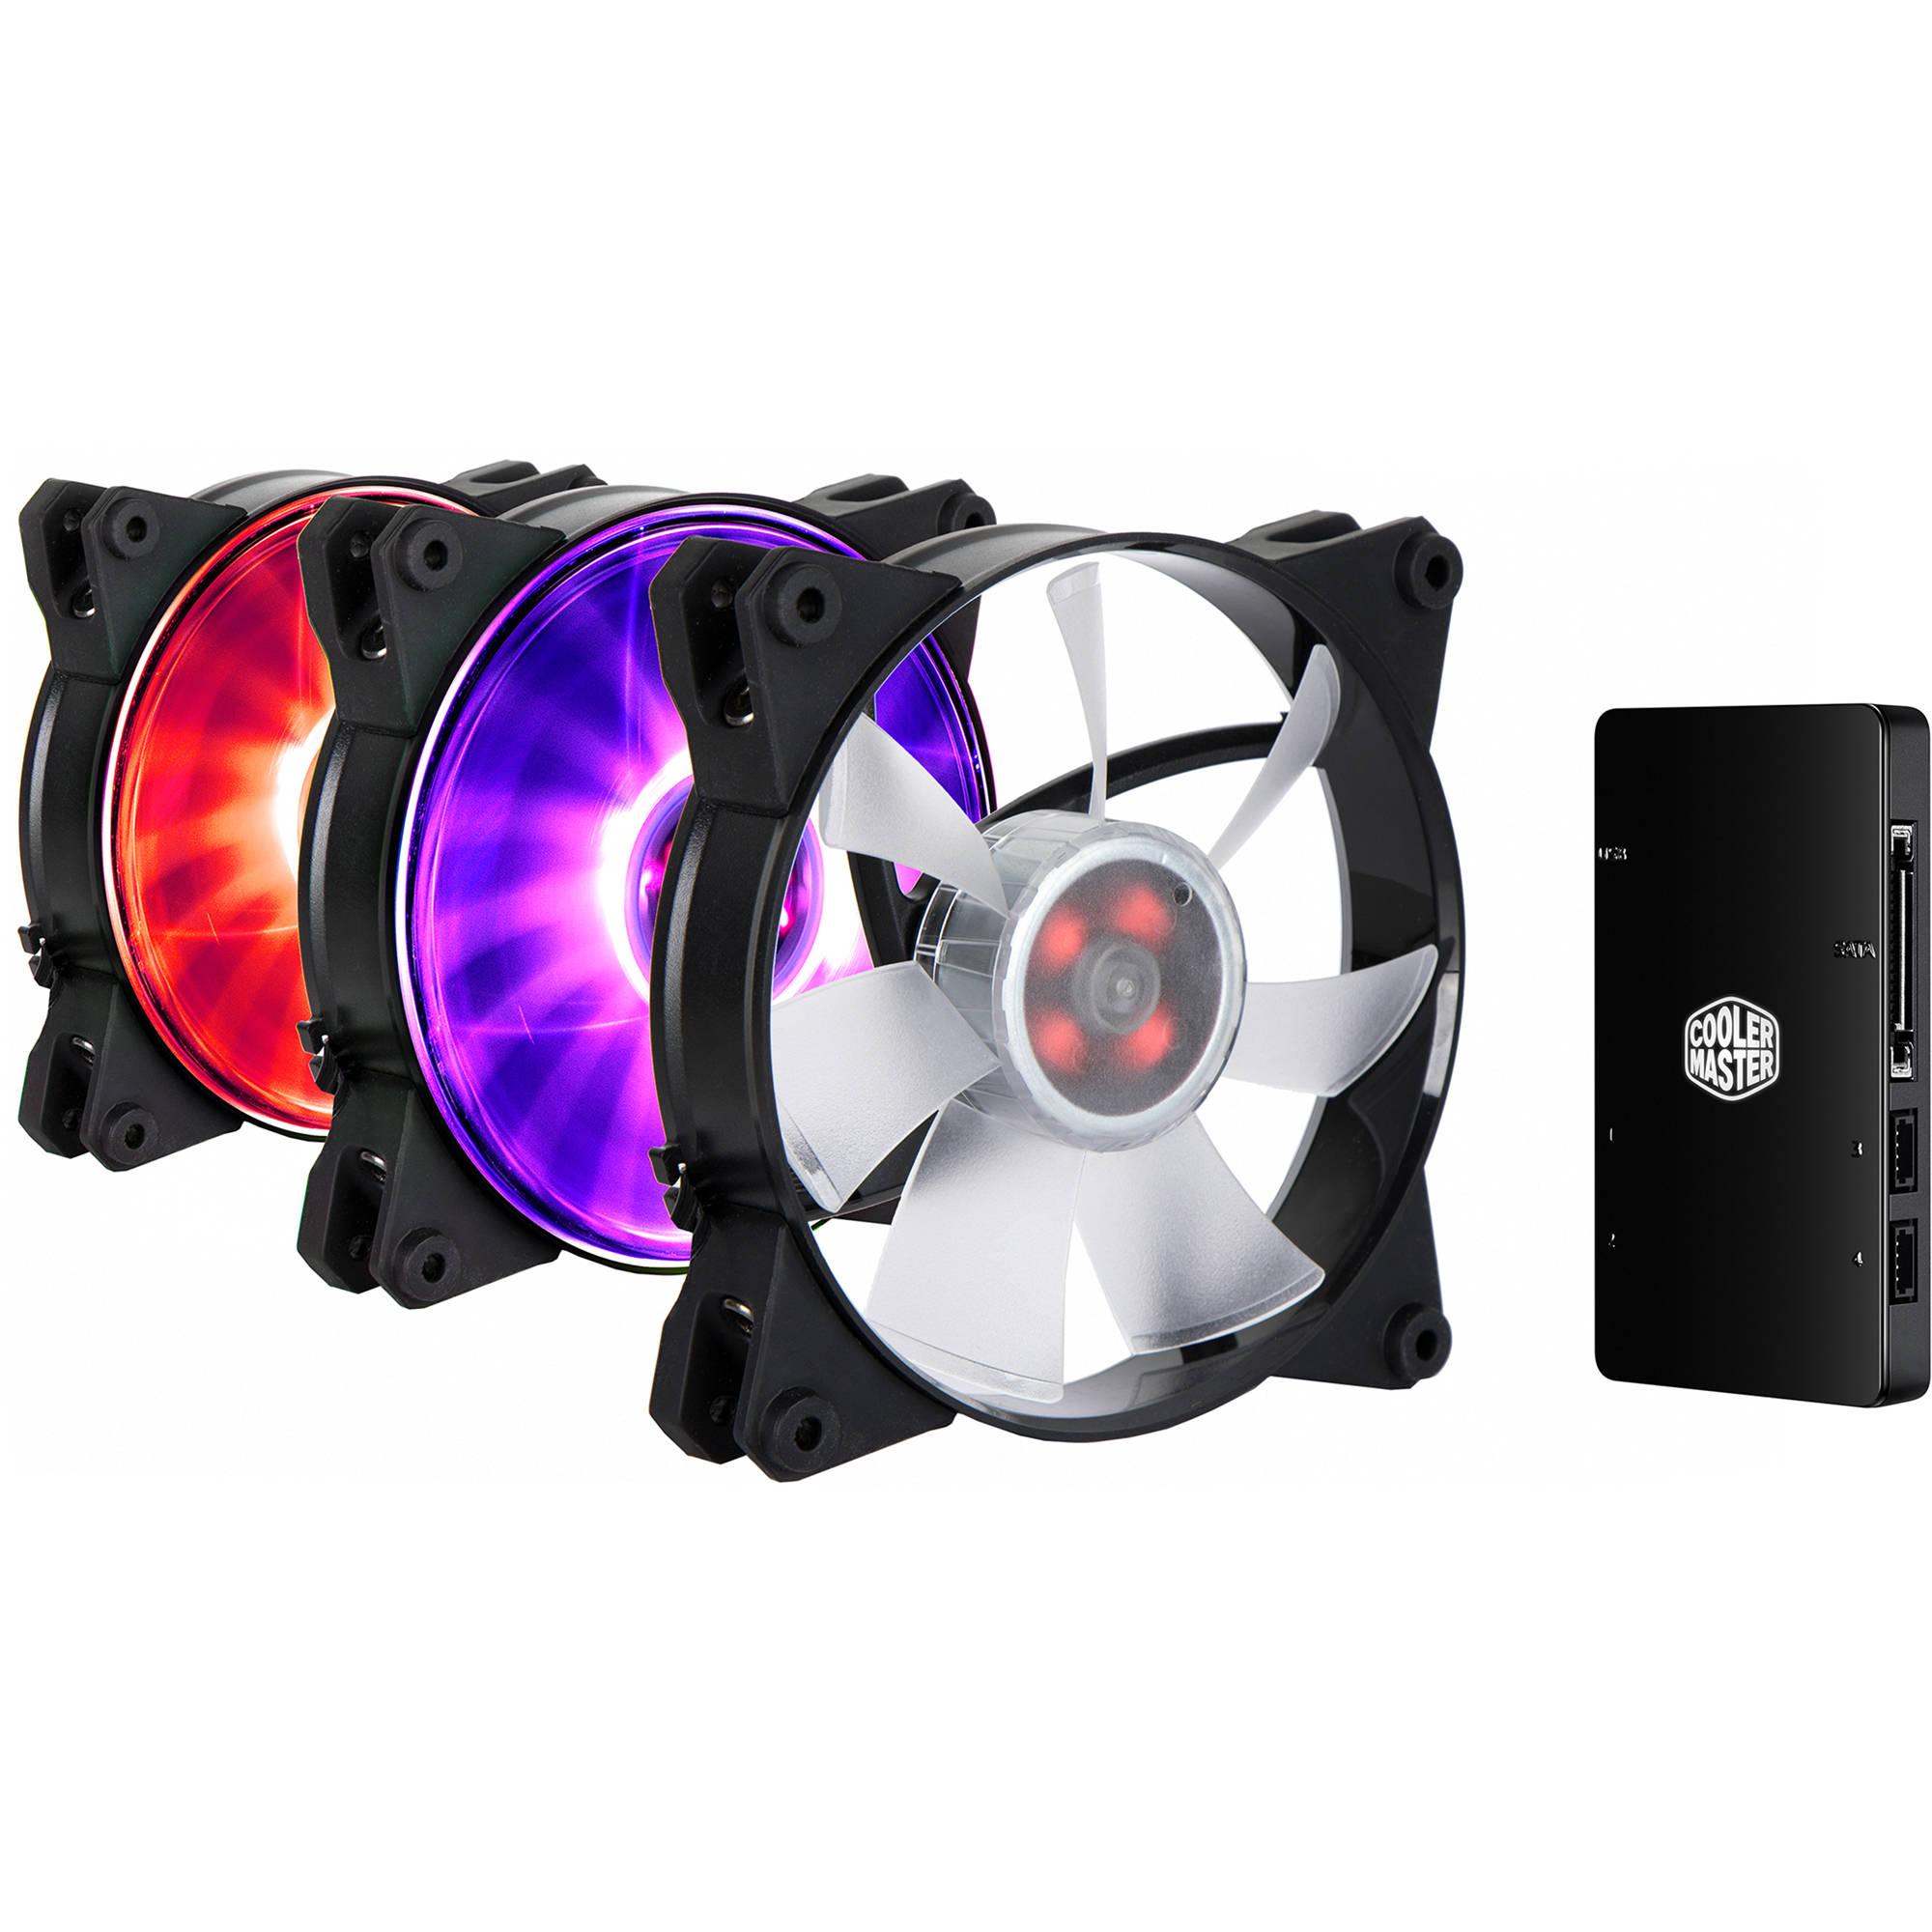 cooler master fan controller